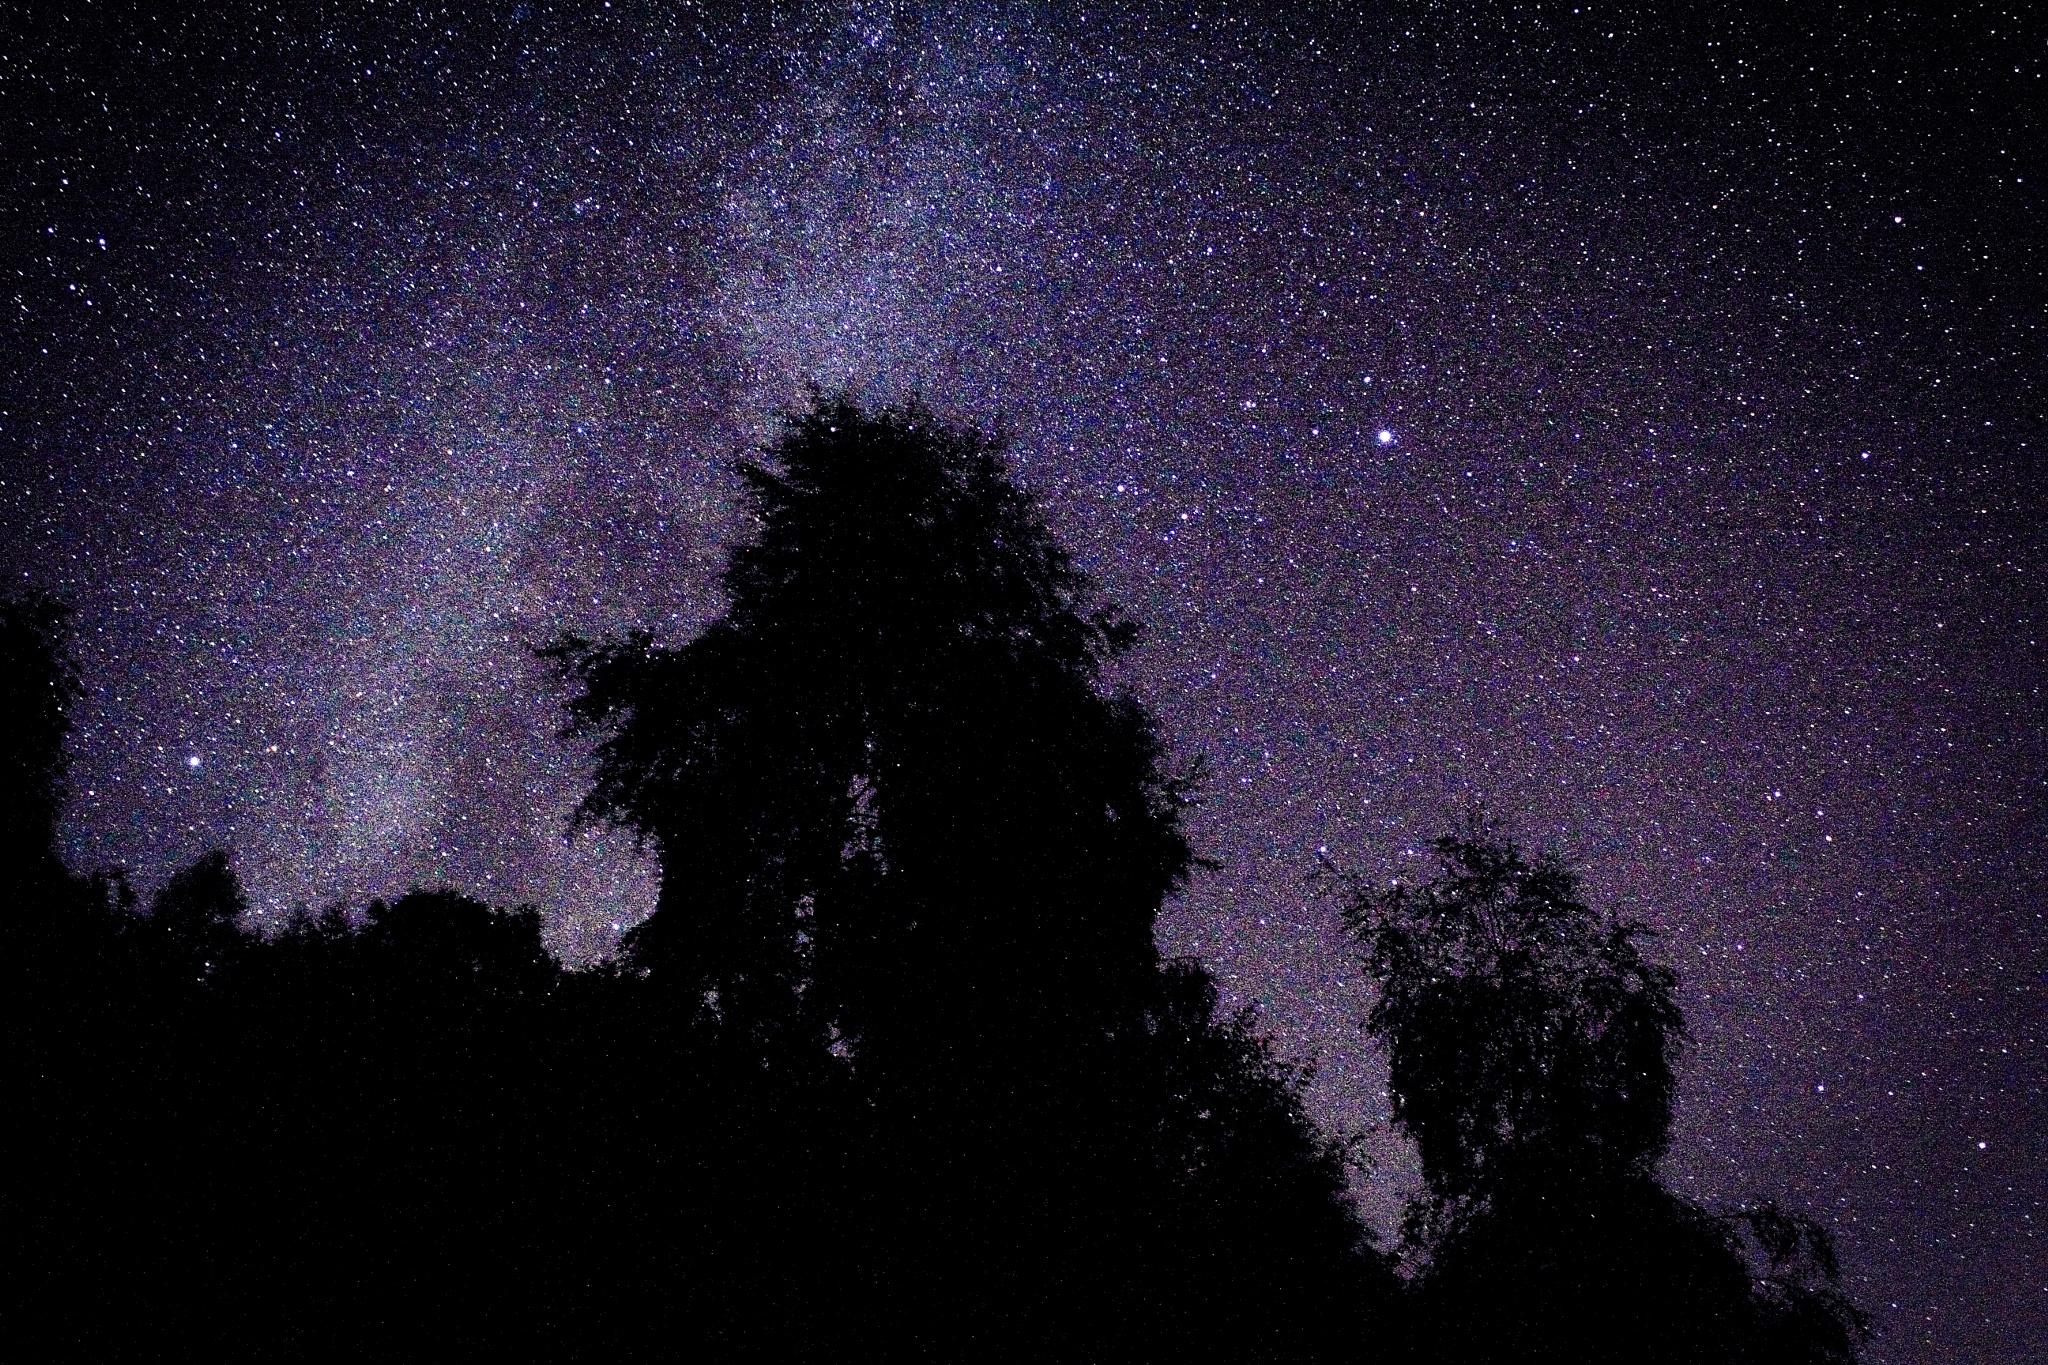 Stars by Steve Flanagan